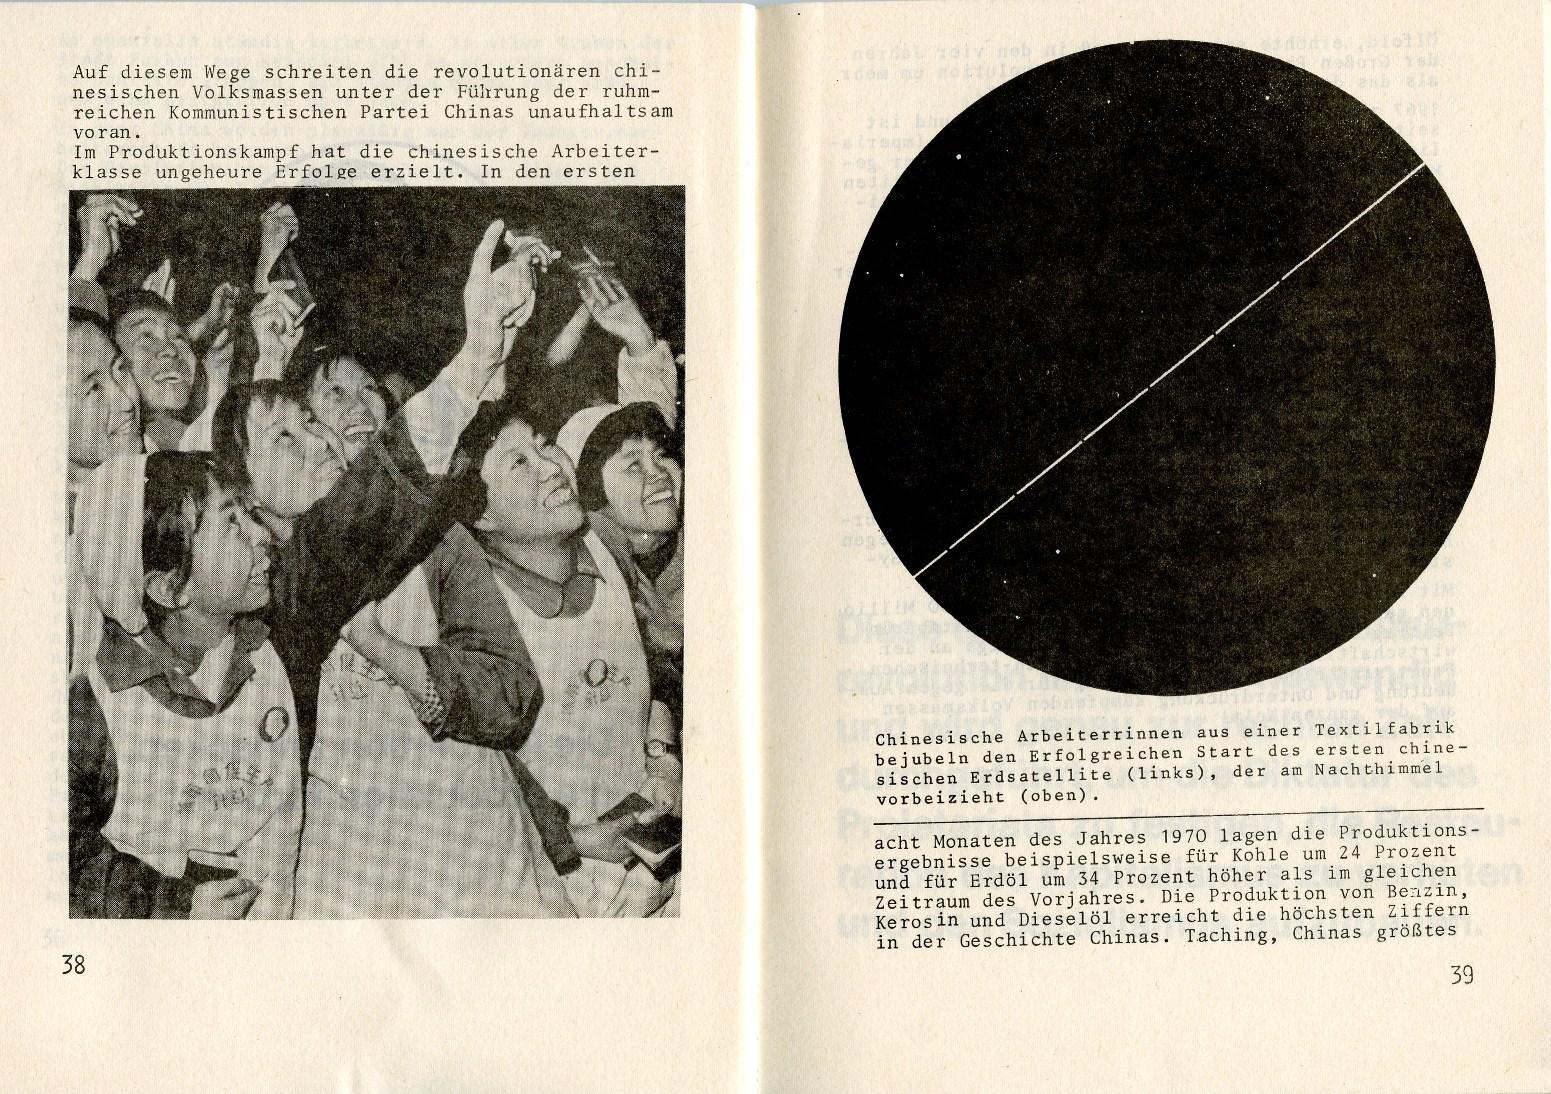 ZB_KPChinas_1971_21